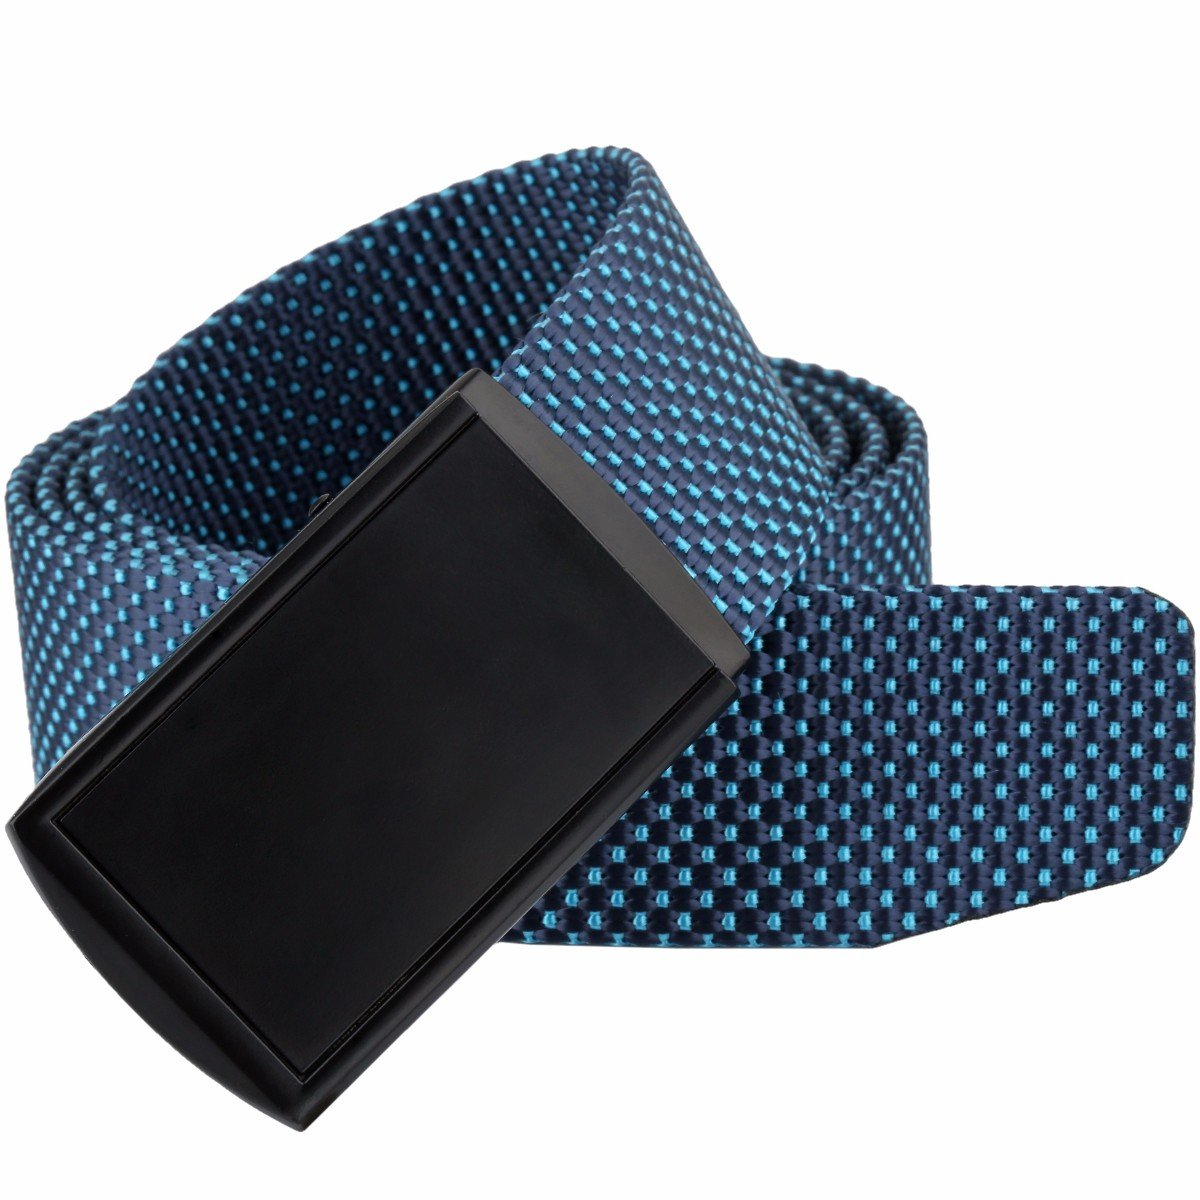 squaregarden Tactical Duty Belts for Men, Military Style Casual Nylon Webbing Belt